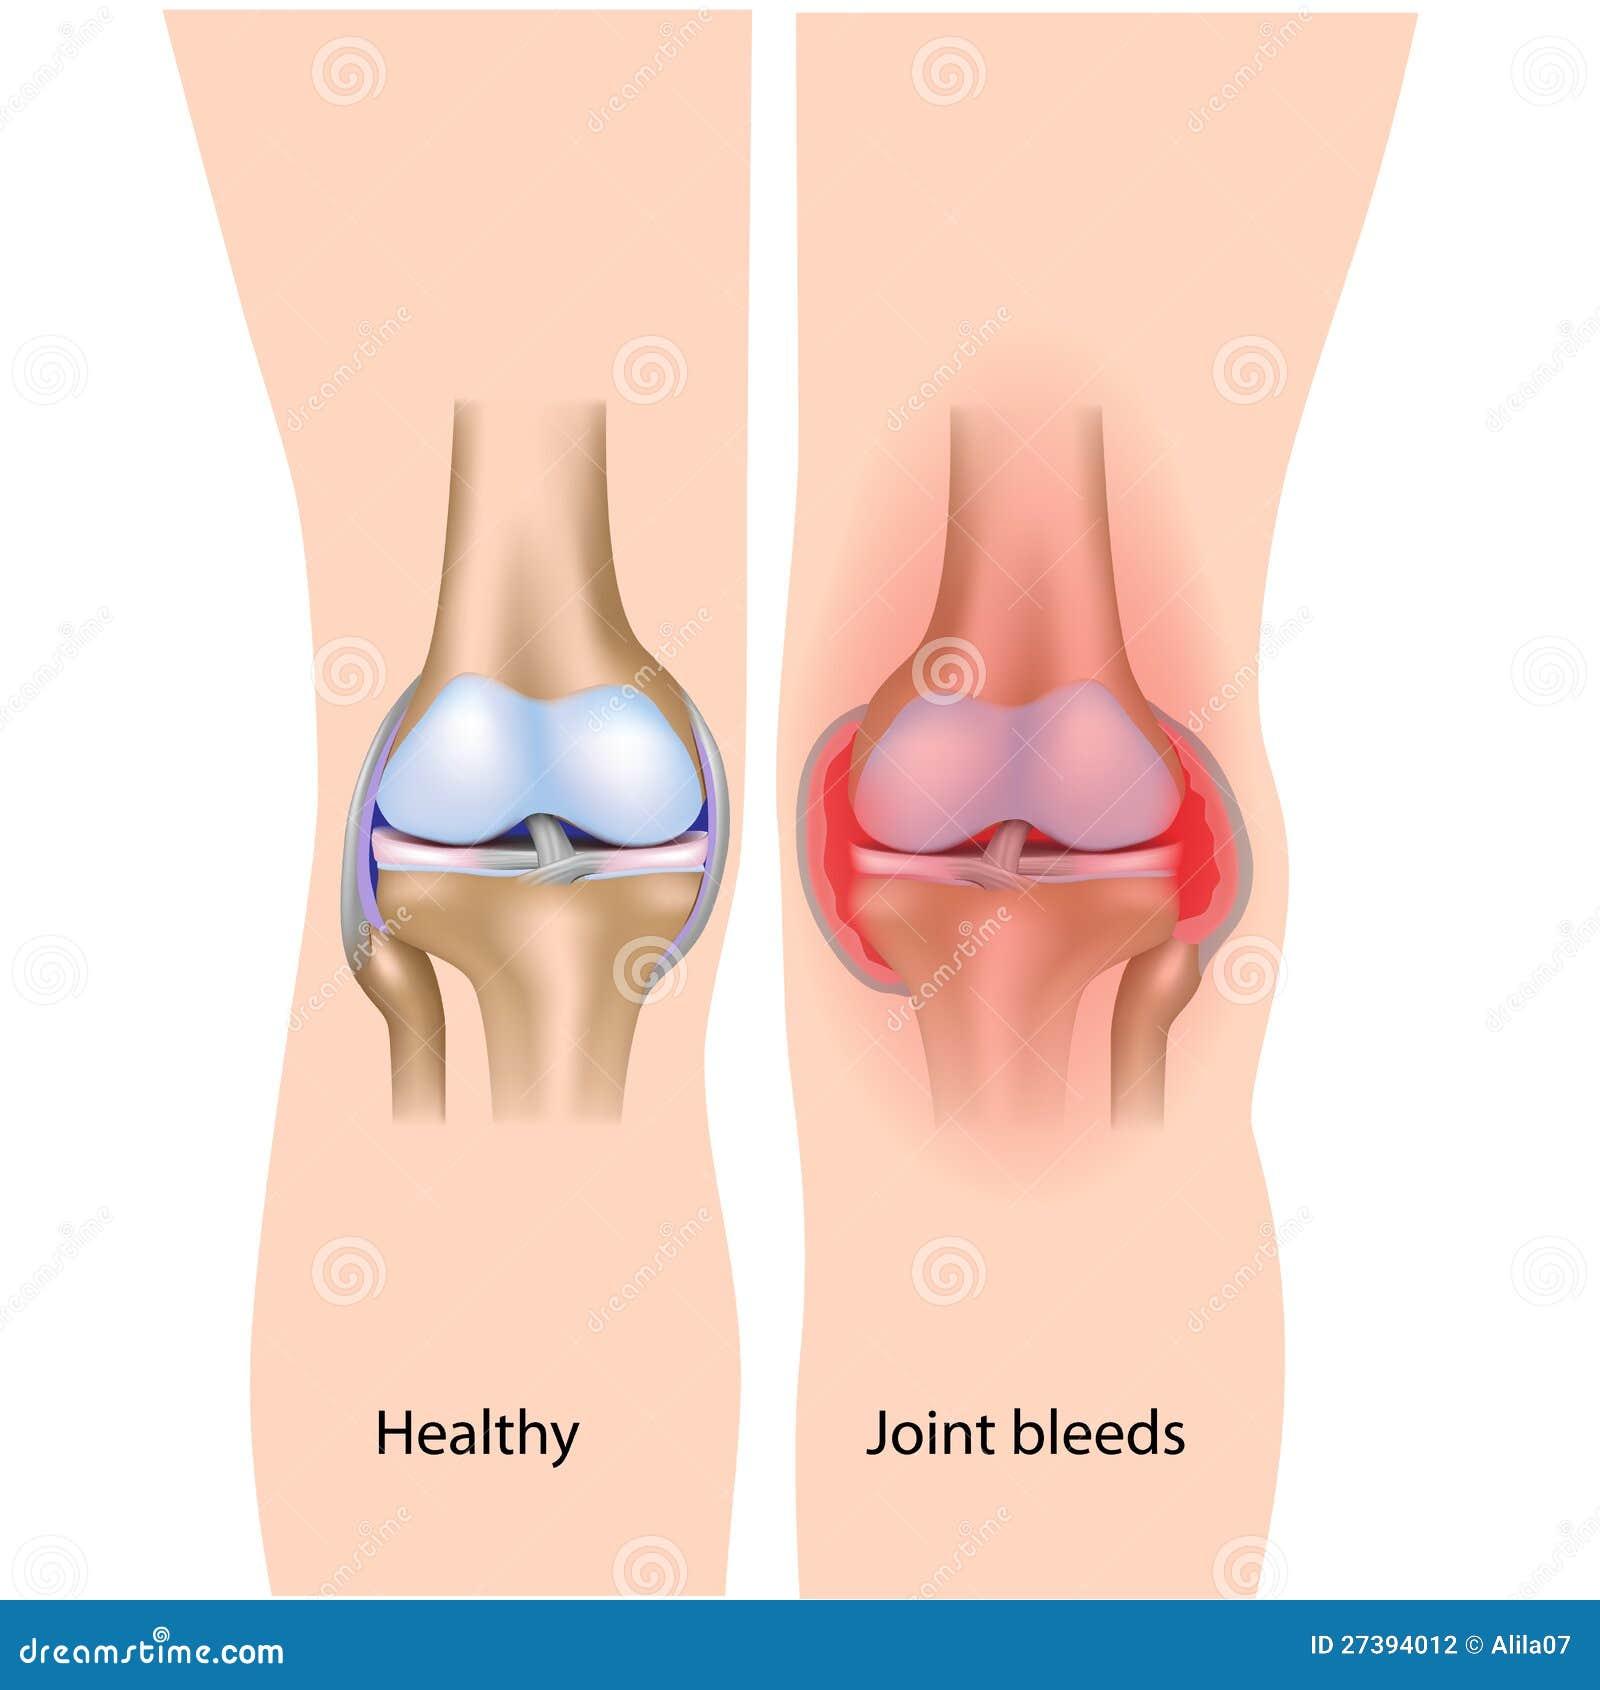 Stock Photography Joint Bleeds Hemophilia Image27394012